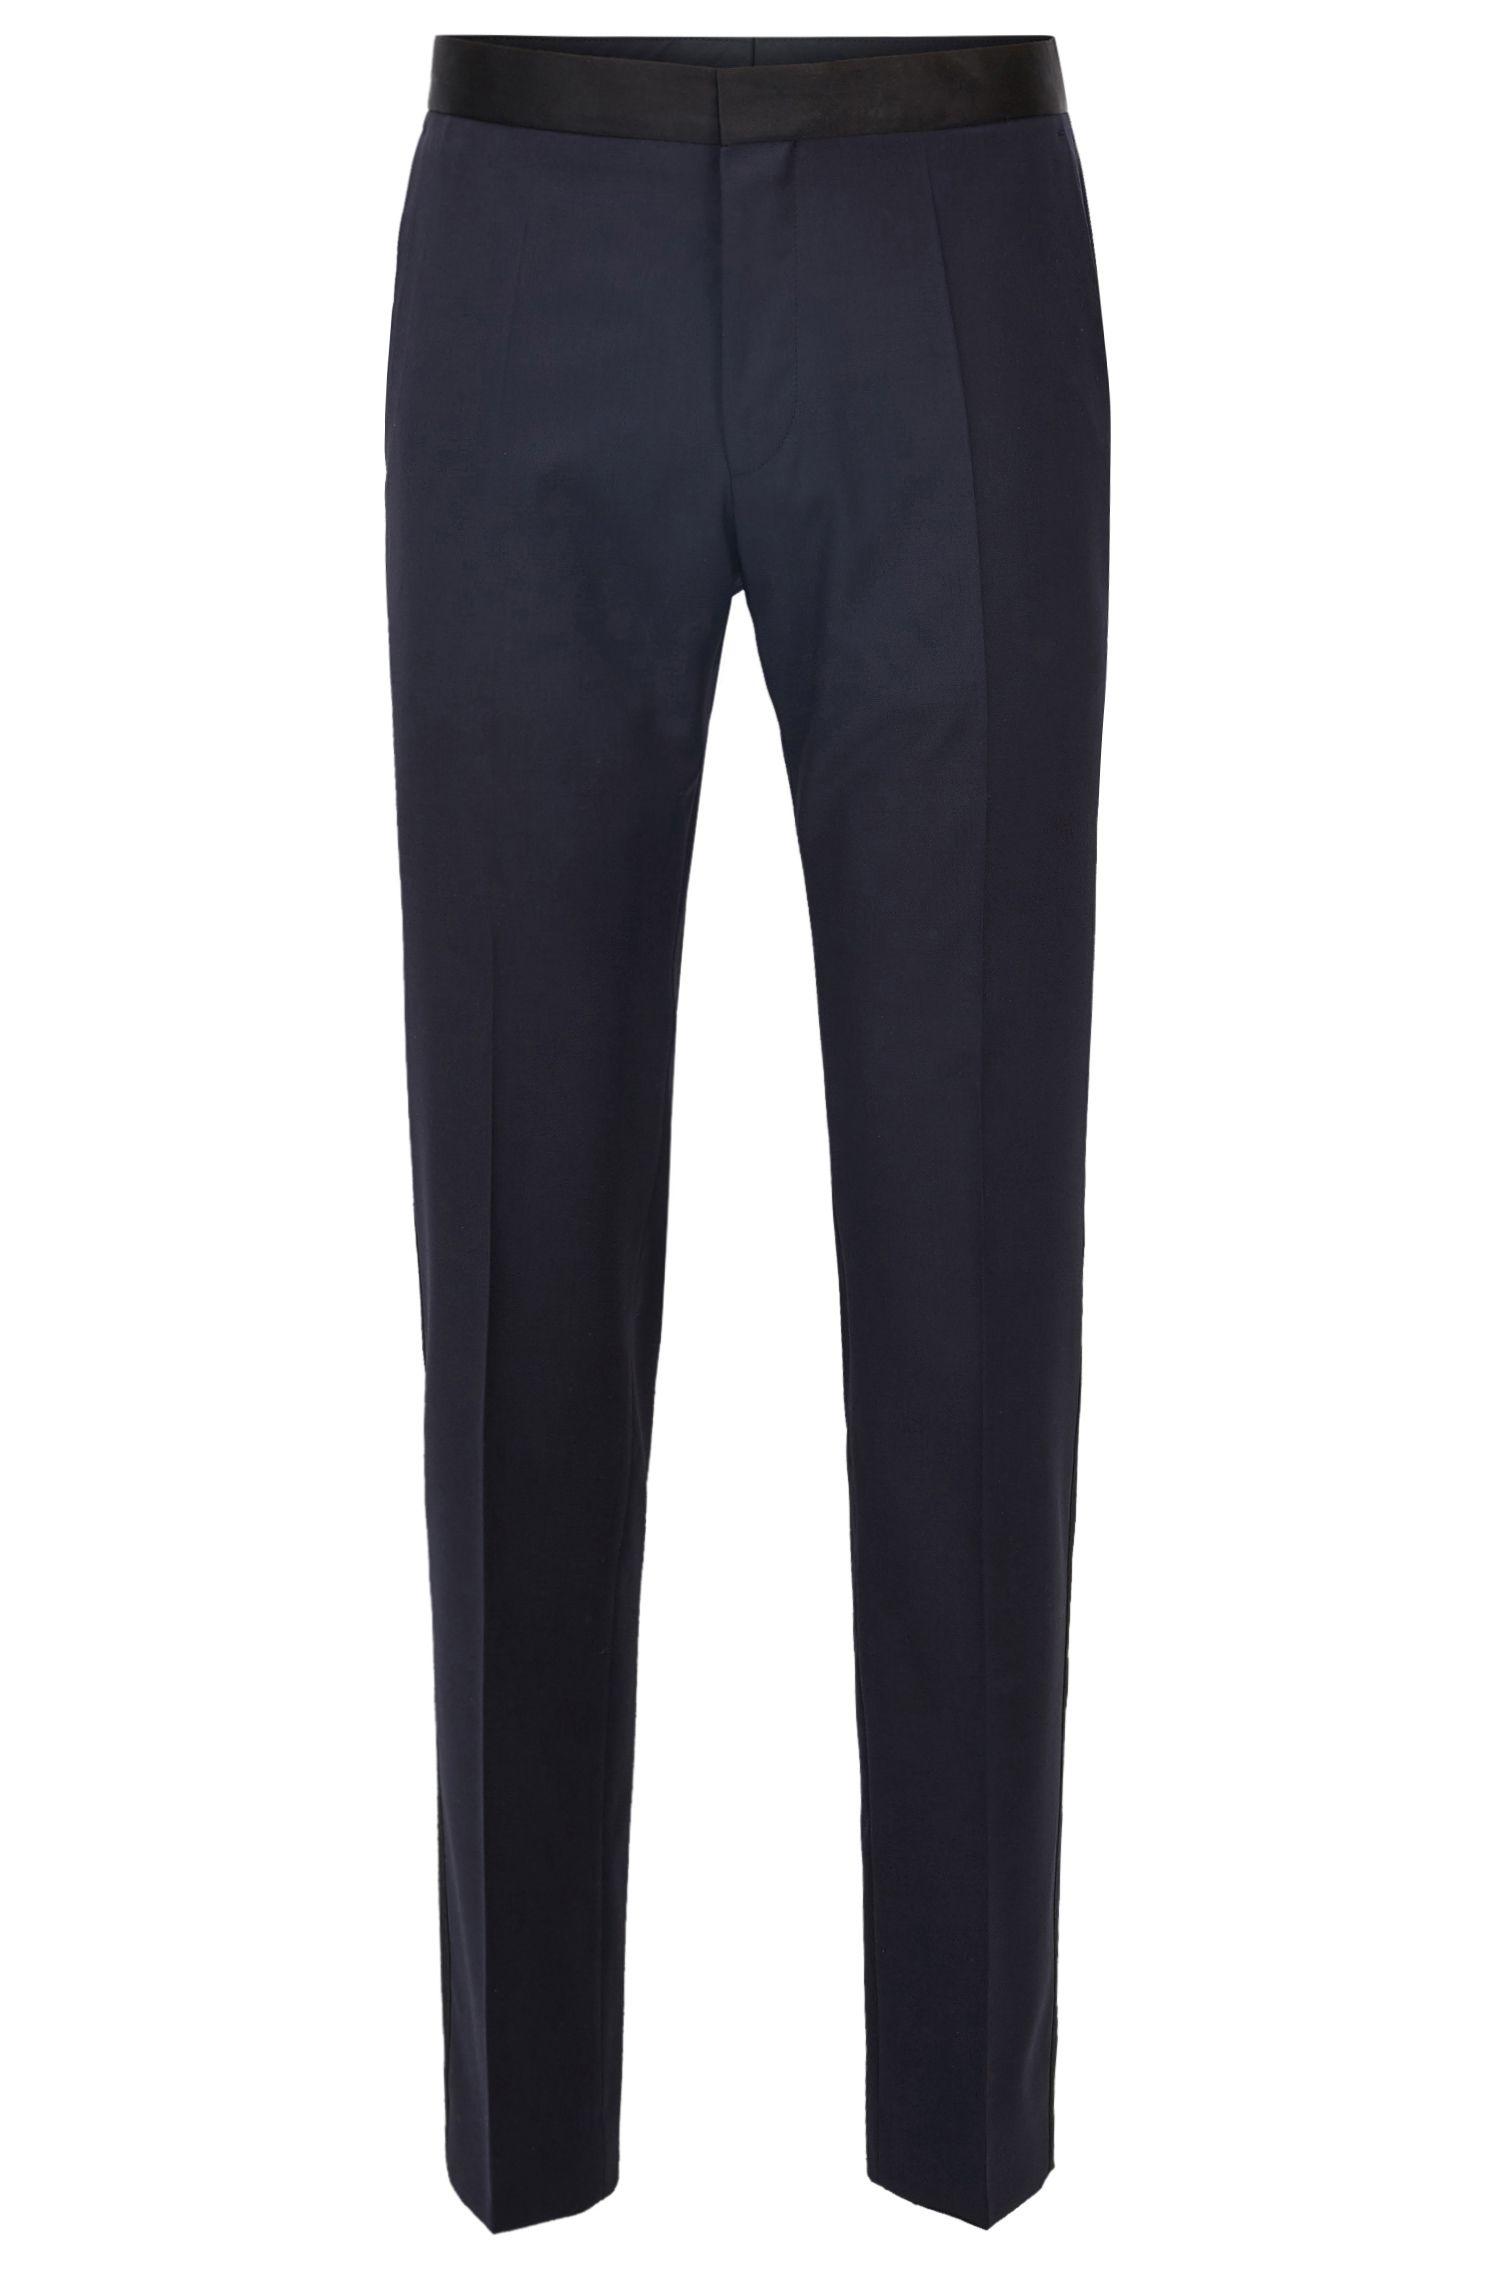 Italian Virgin Wool Pant, Slim Fit | Gilan CYL, Dark Blue